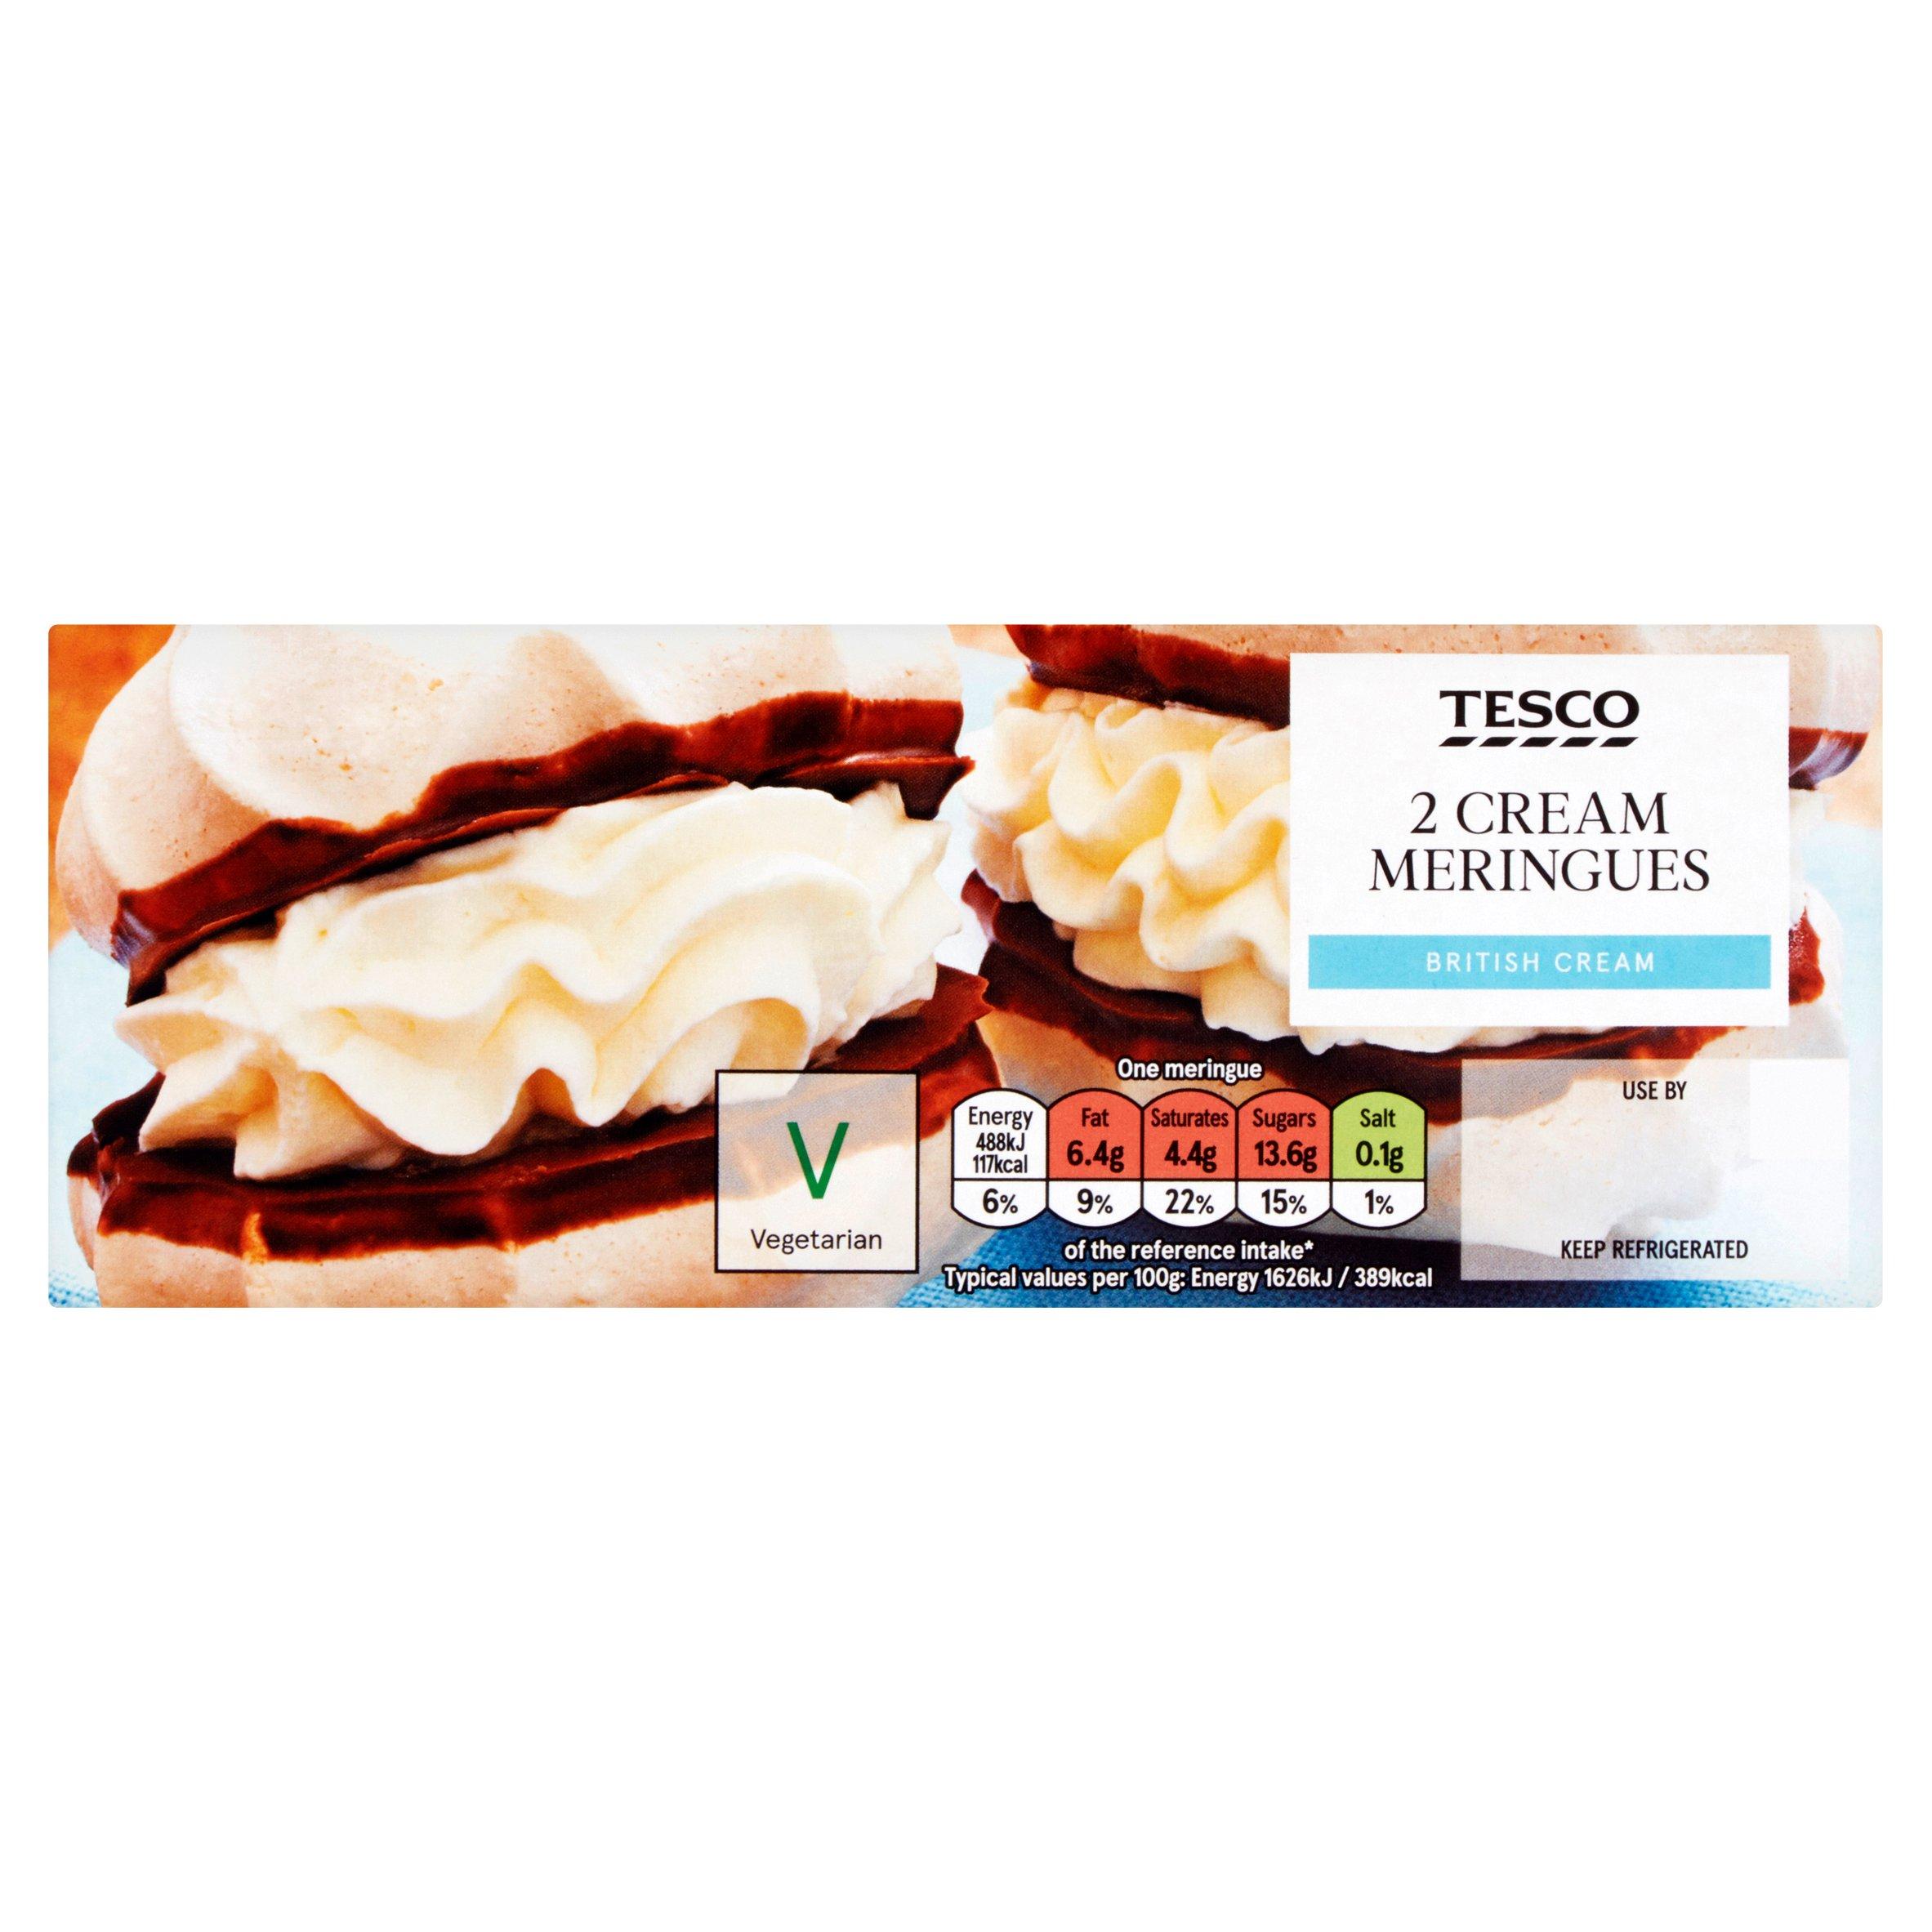 Tesco Fresh Cream Meringues 2 Pack